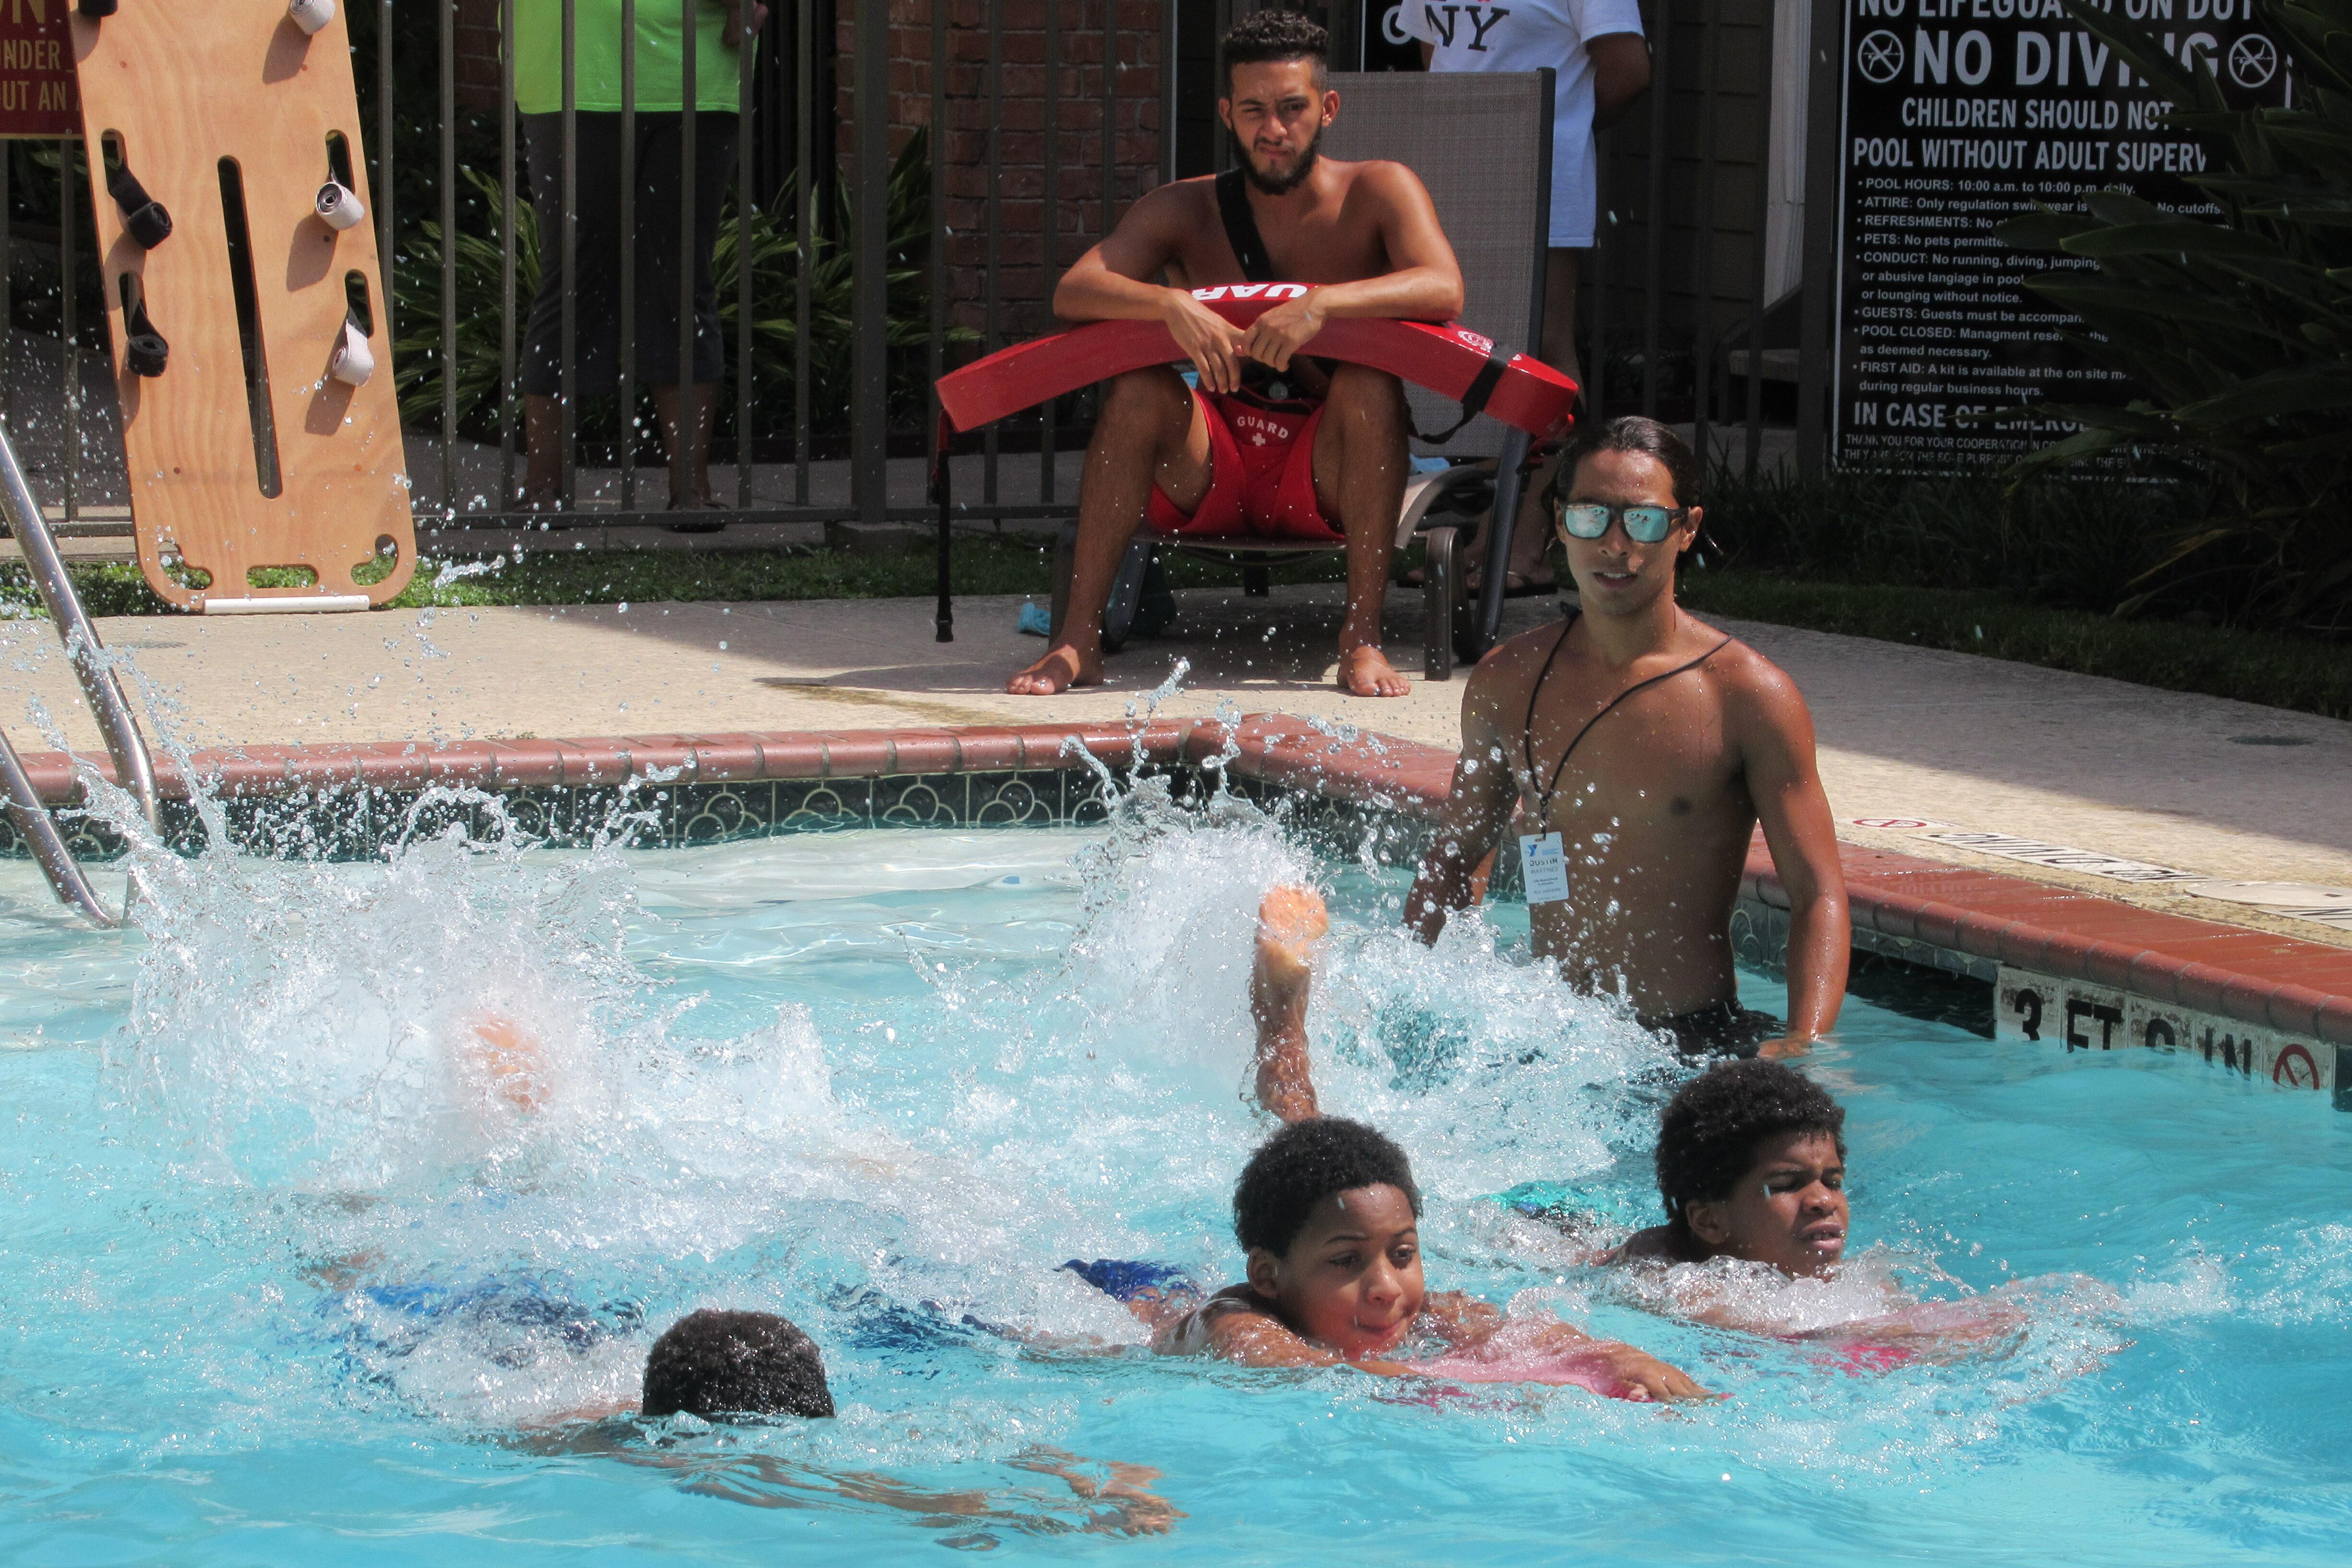 Water Safety Program at Washington Courtyards